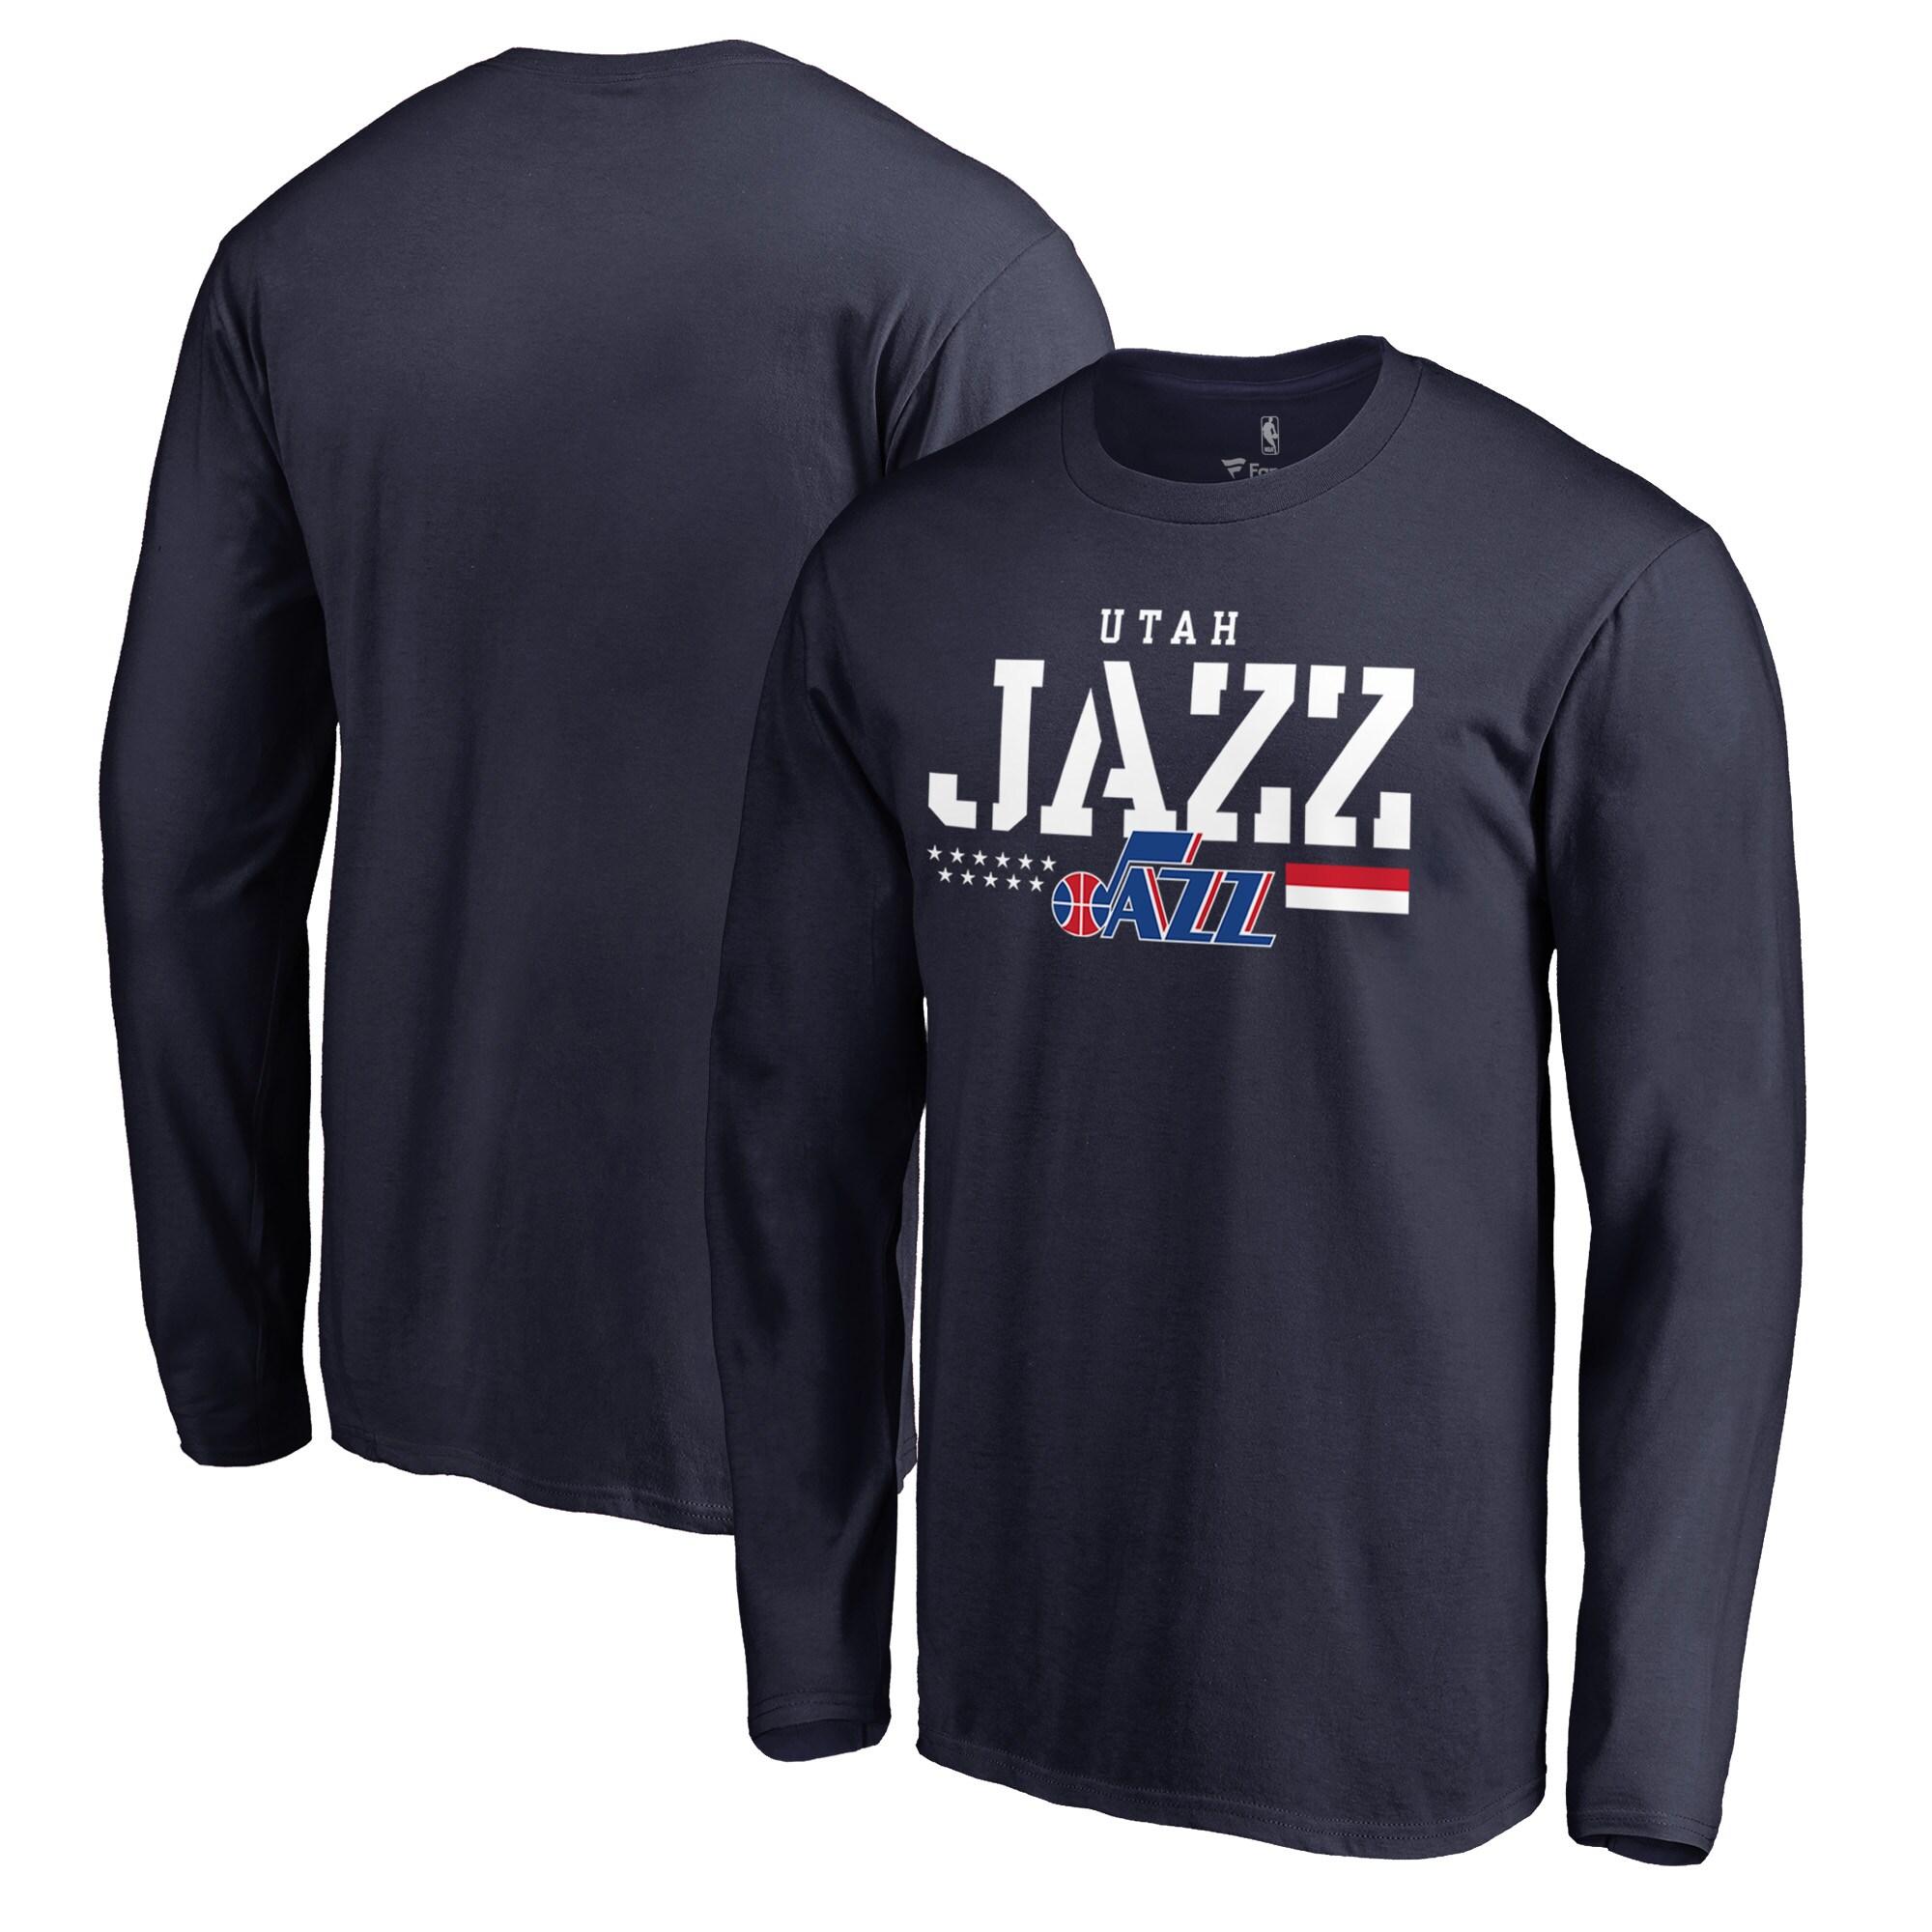 Utah Jazz Fanatics Branded Hoops For Troops Long Sleeve T-Shirt - Navy